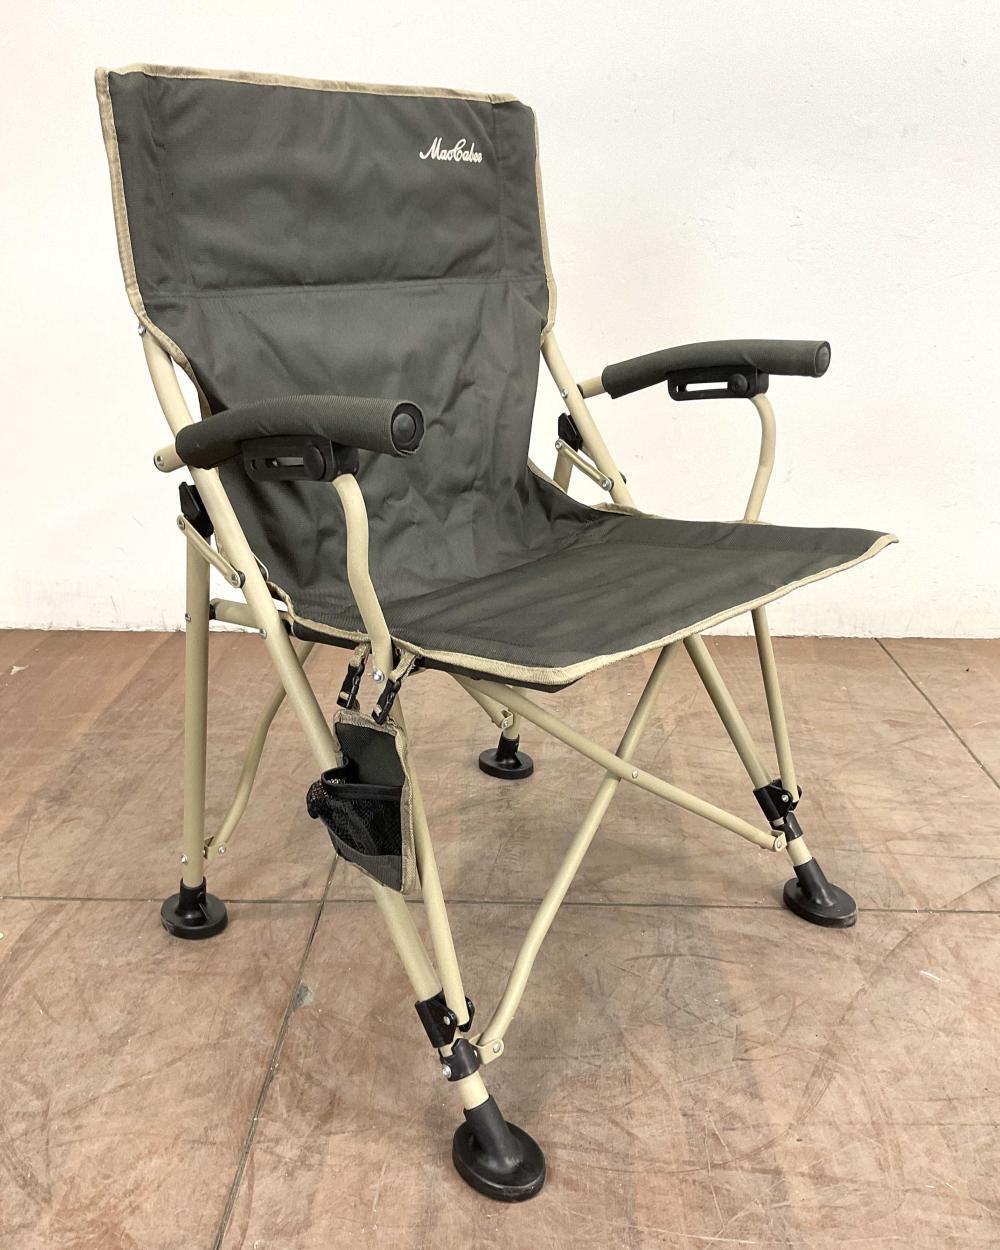 Maccabee Aluminum Folding Sports Chair & Carry Bag